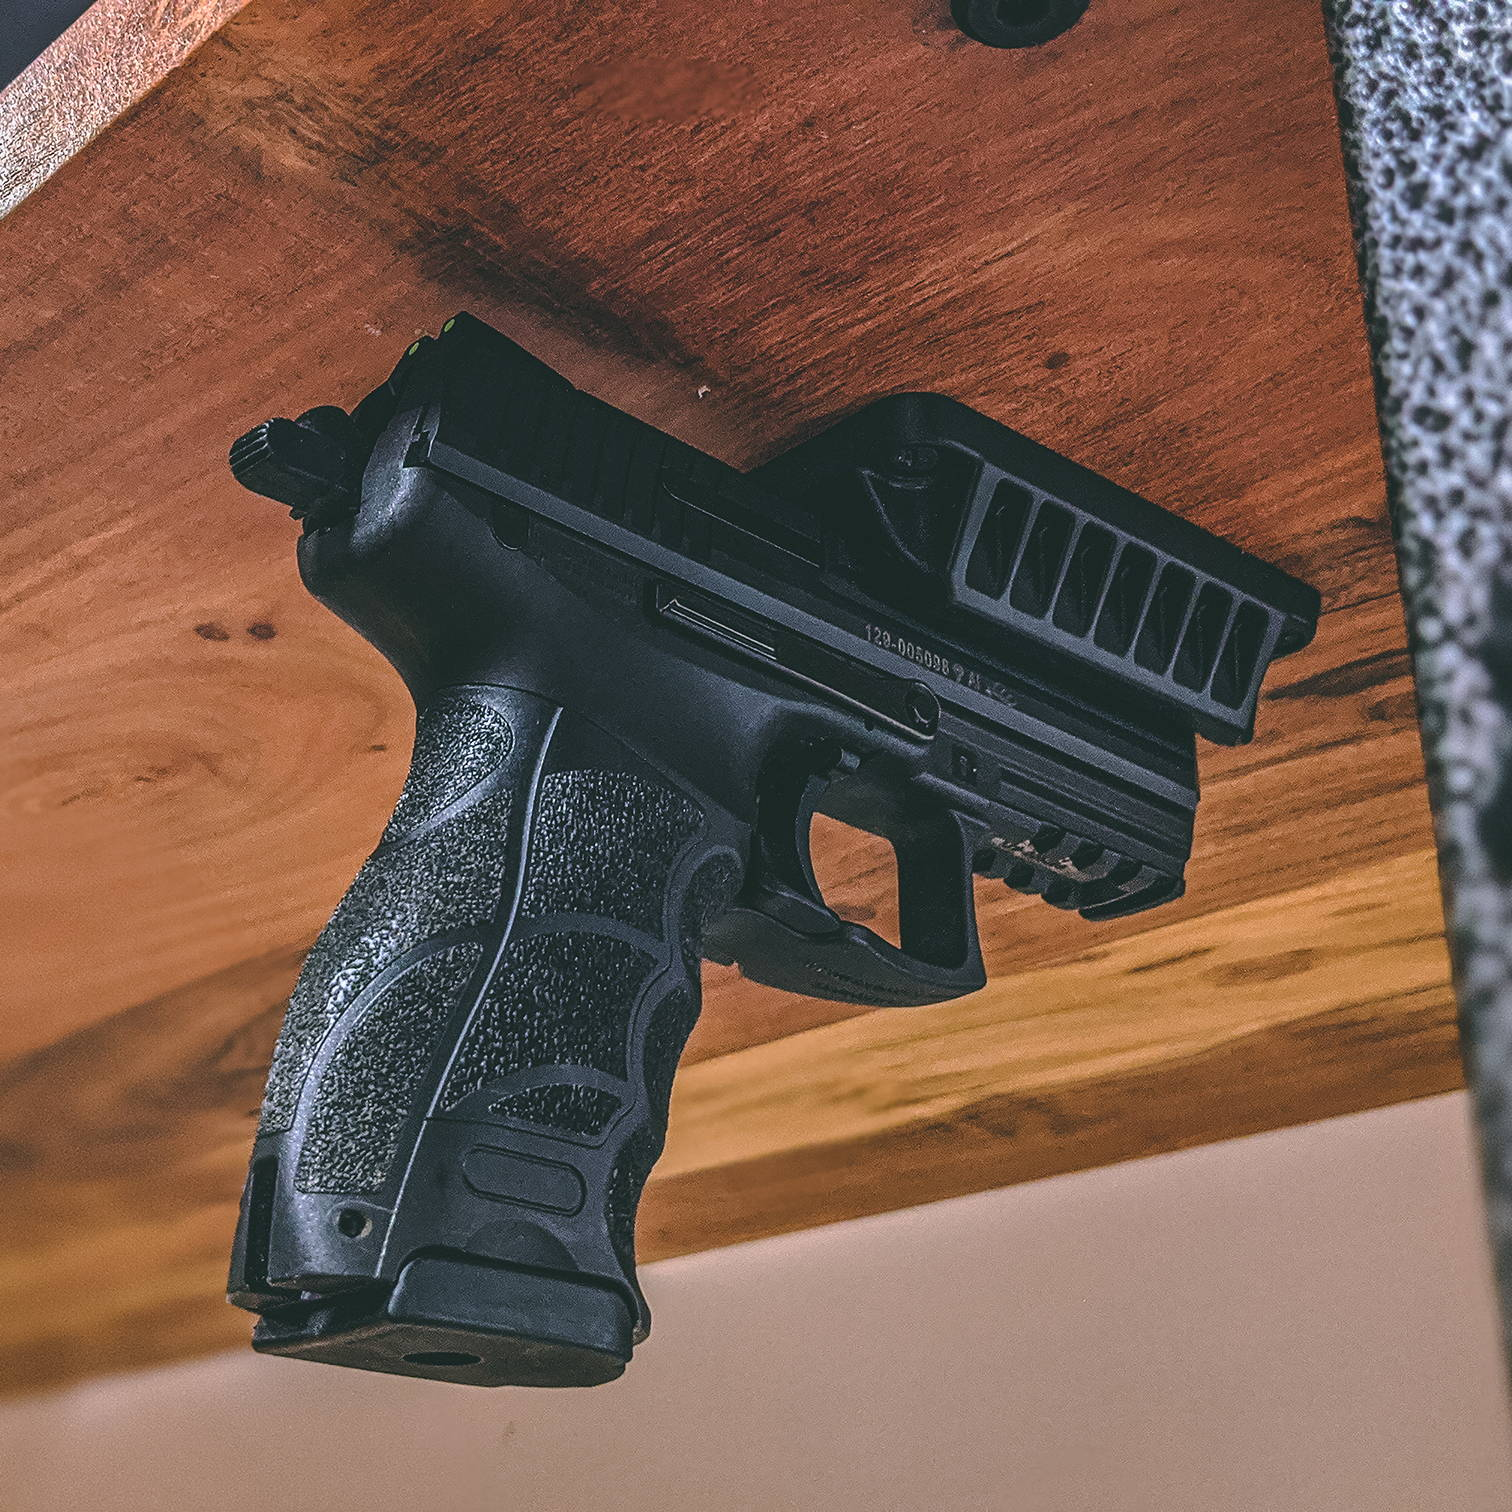 Concealed Magnetic Gun Mount Holder Pistol Rifle Holster Bracket Magnet Stand Holder for Gun Hide In Truck Car Under Table Wall